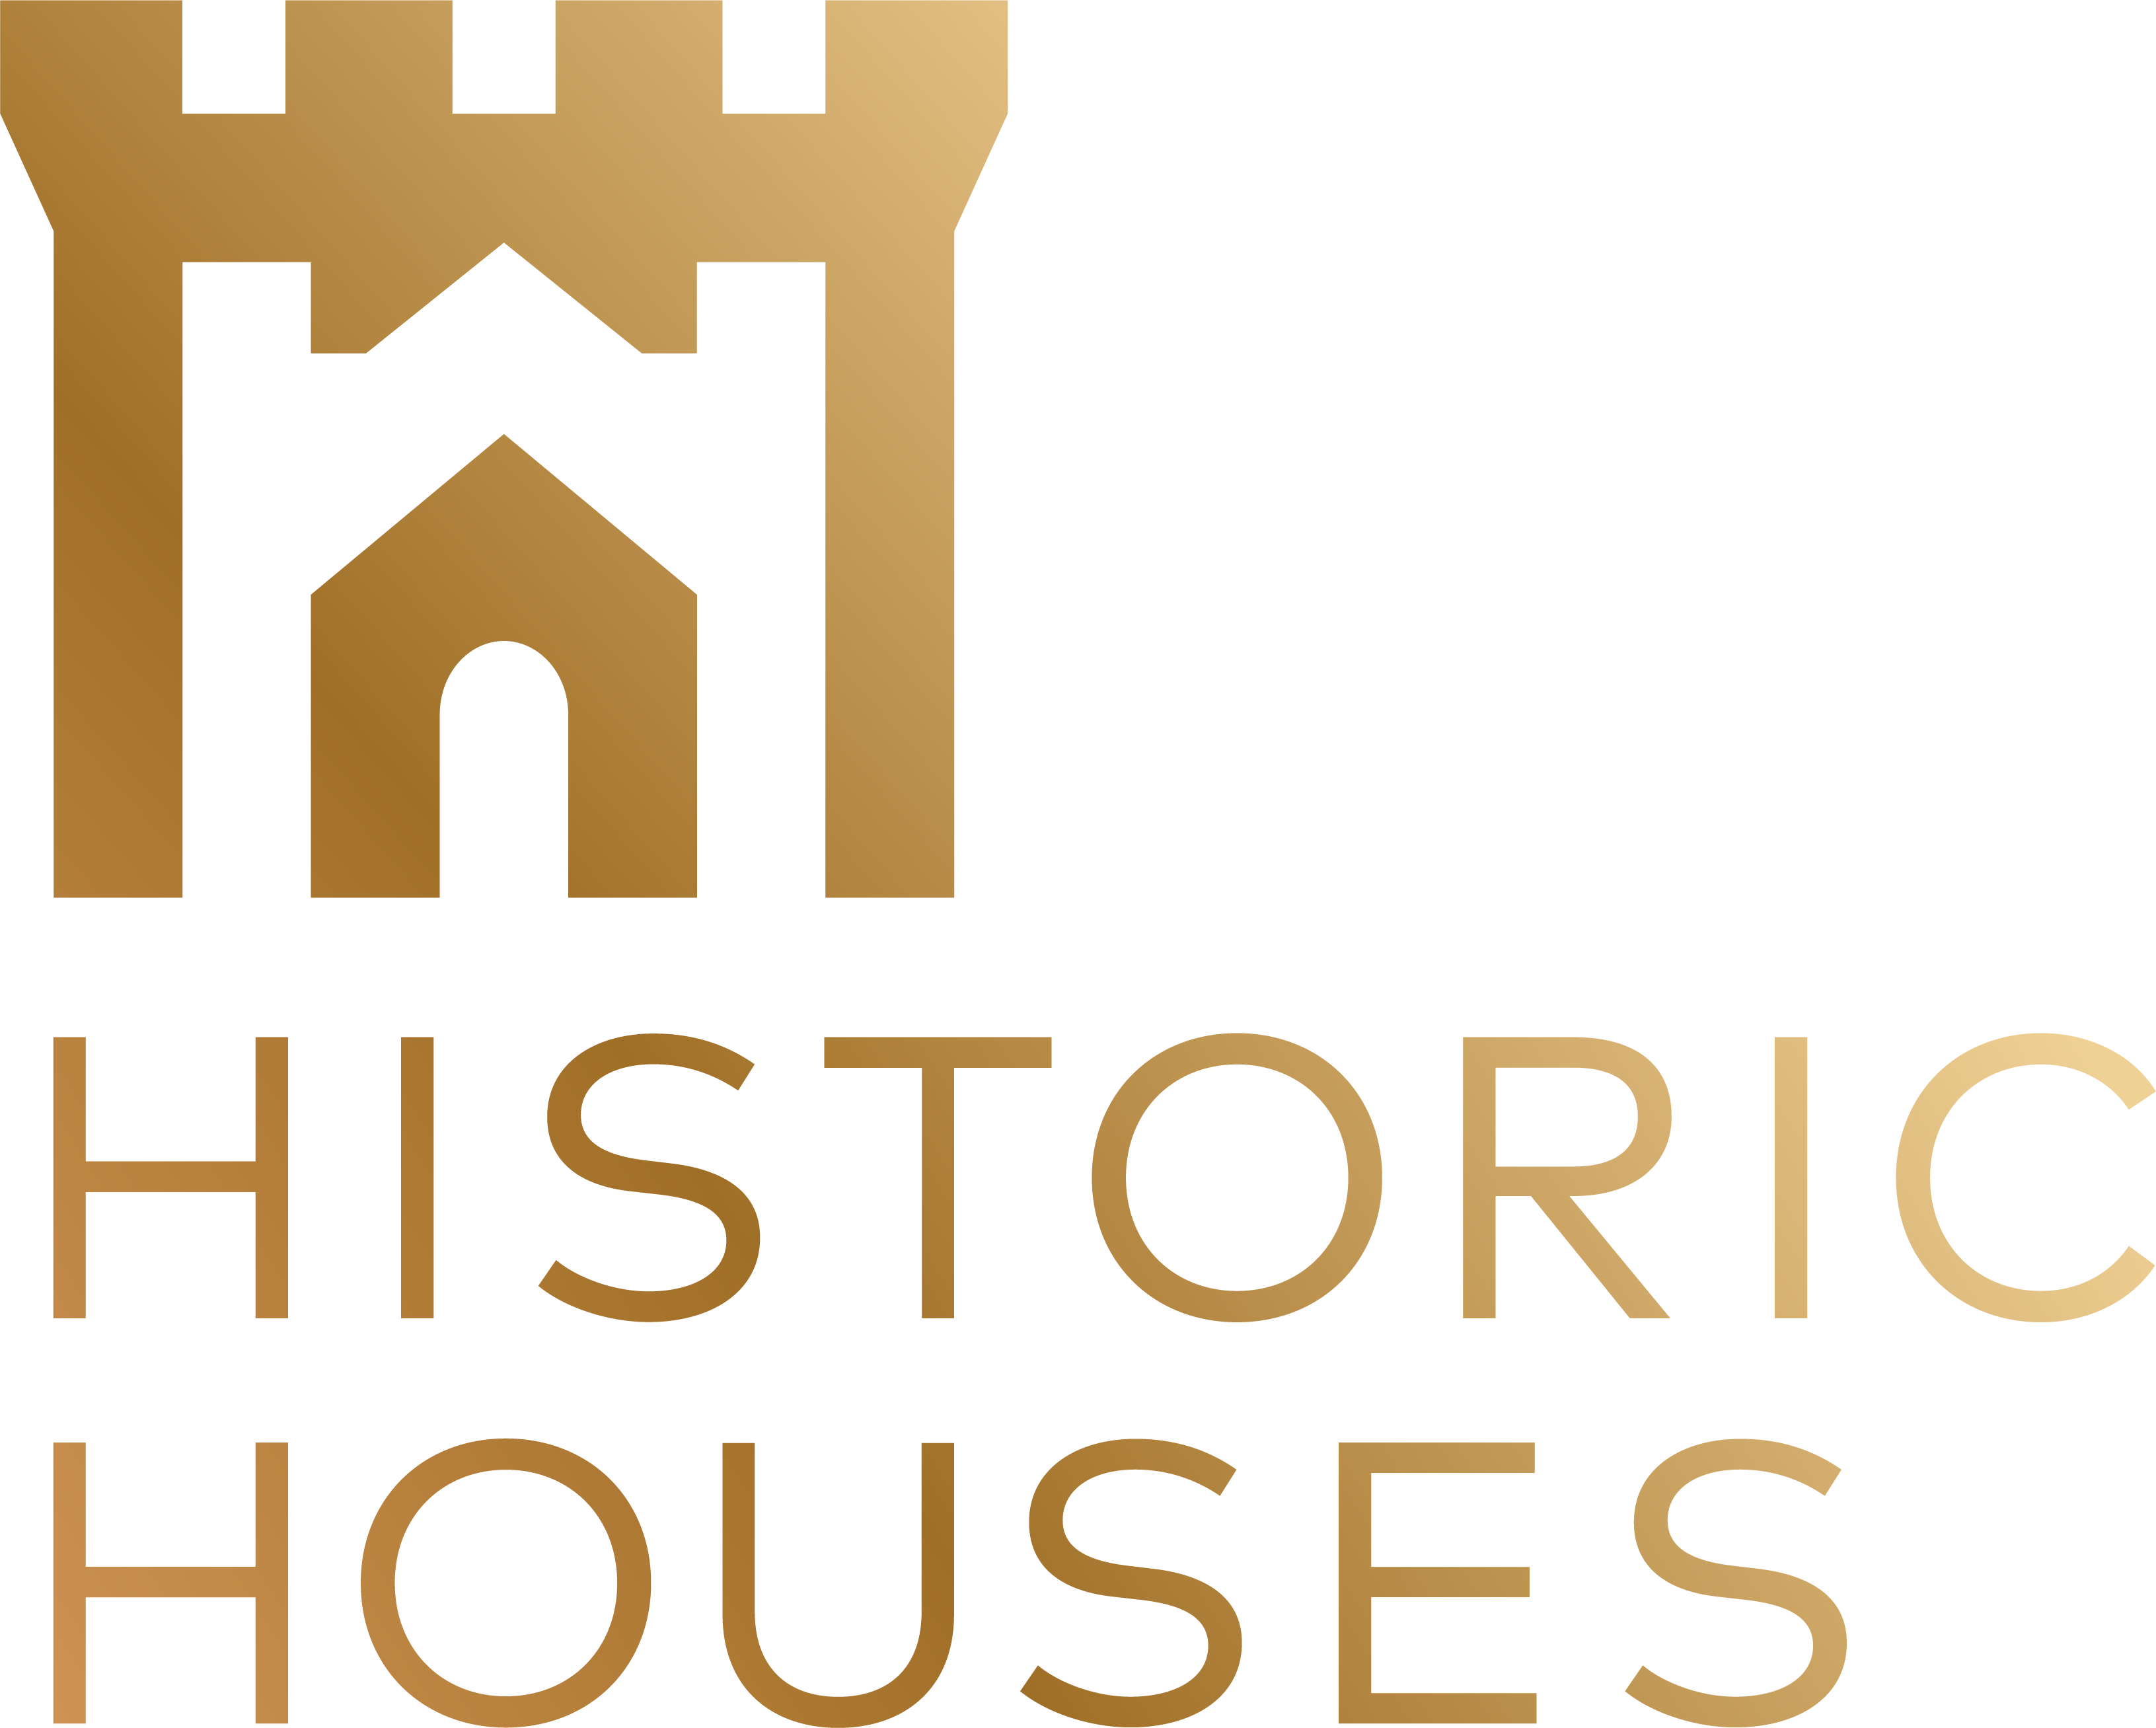 HistoricHouses_MasterLogo_Portrait_Gold_RGB